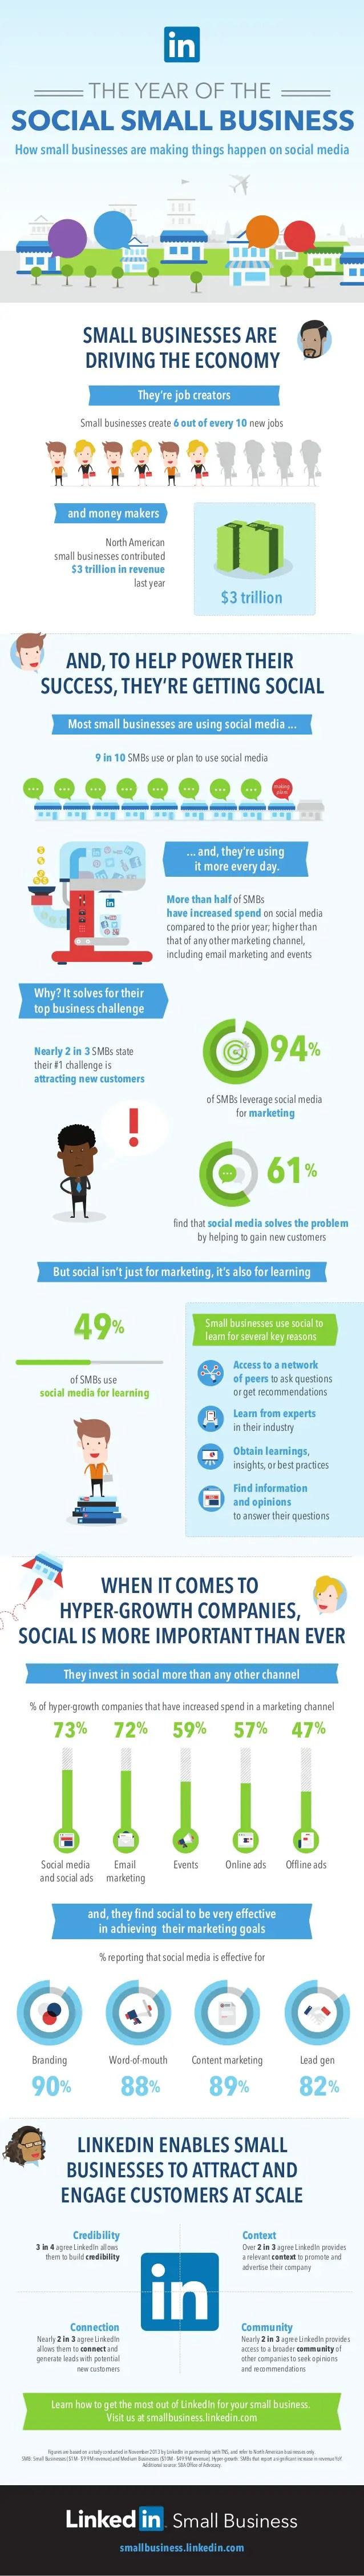 LinkedIn_SMB_infographic